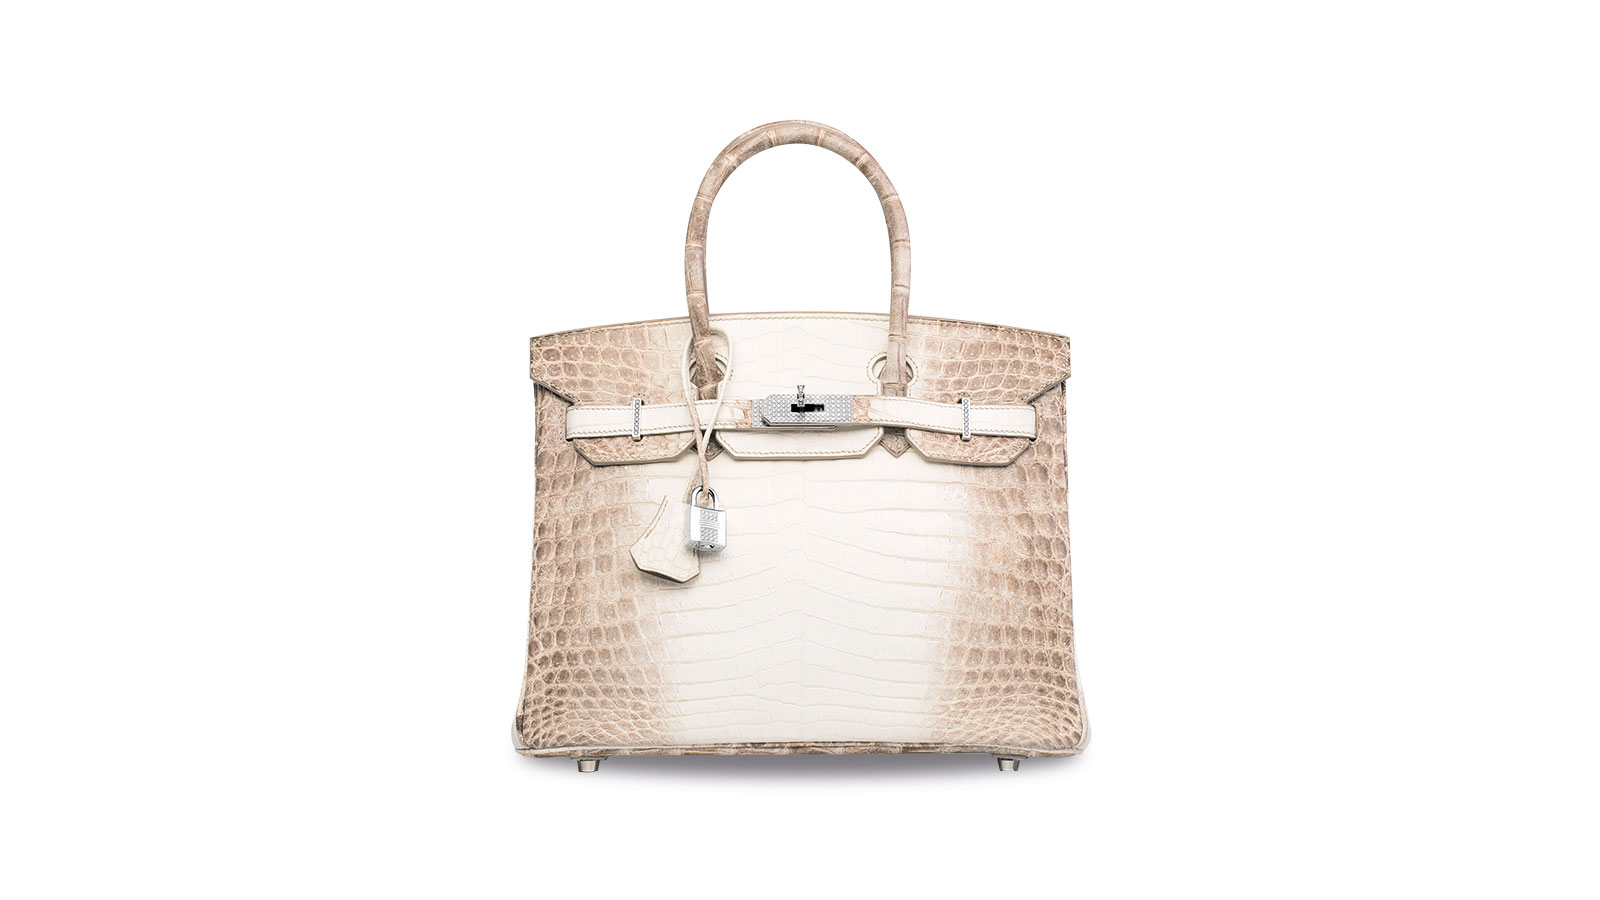 The Most Expensive Handbag Ever Sold Diamond Hermes Cnn Style